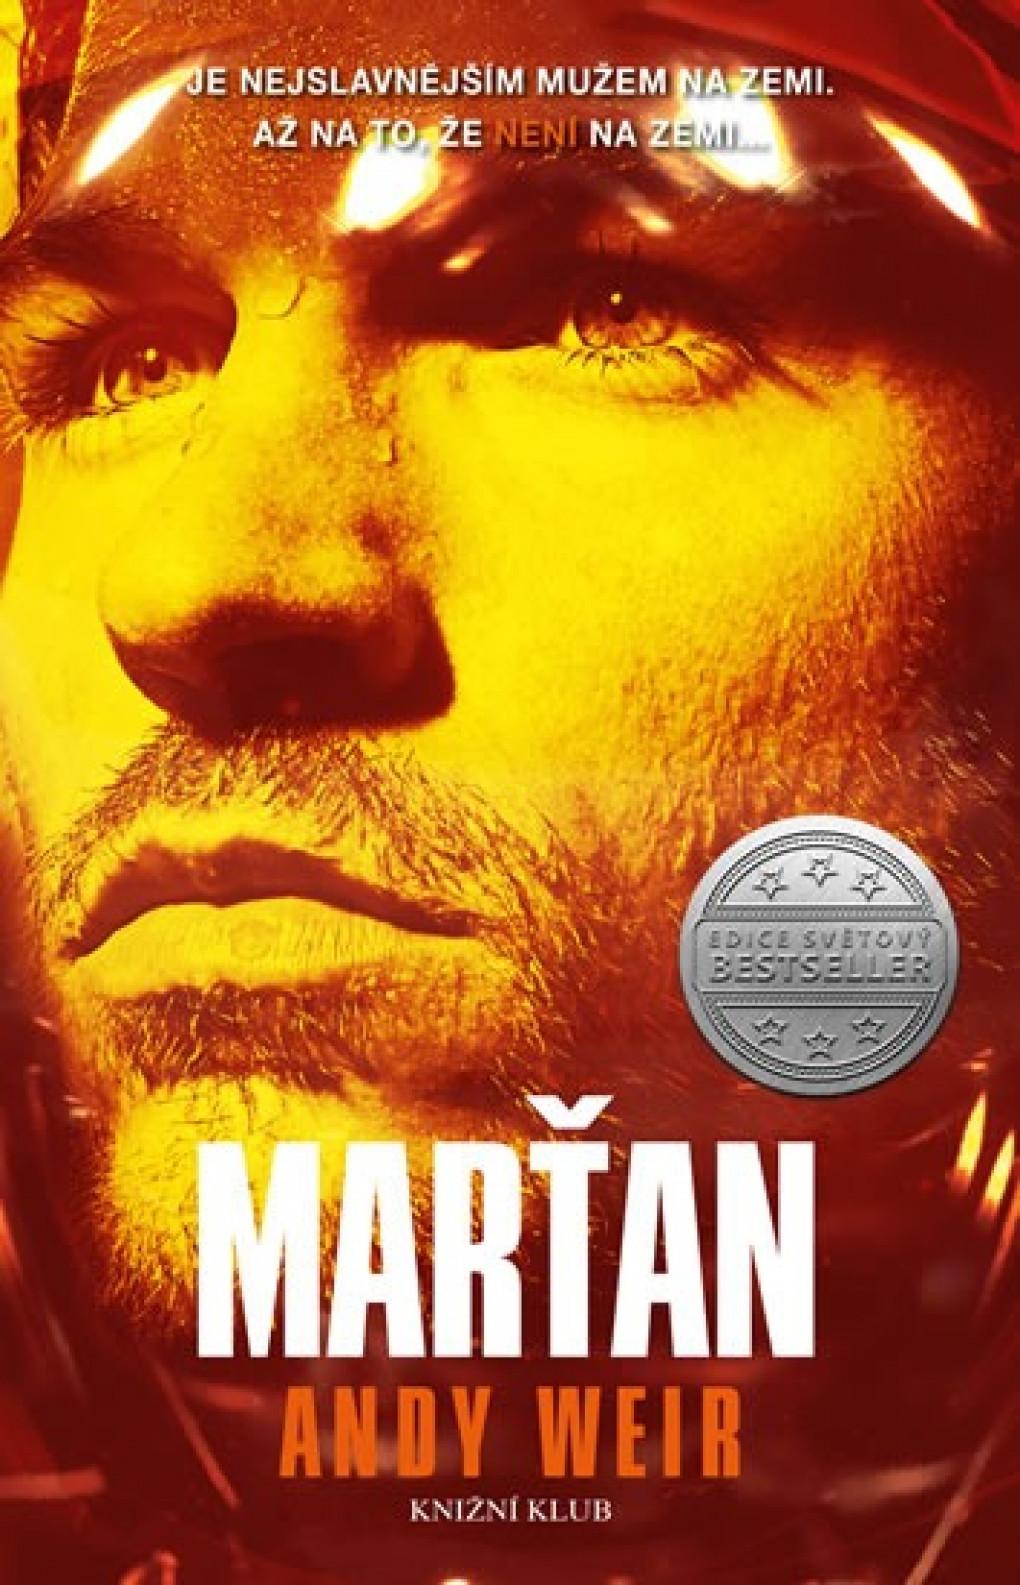 big_martan-3bs-225946.jpg